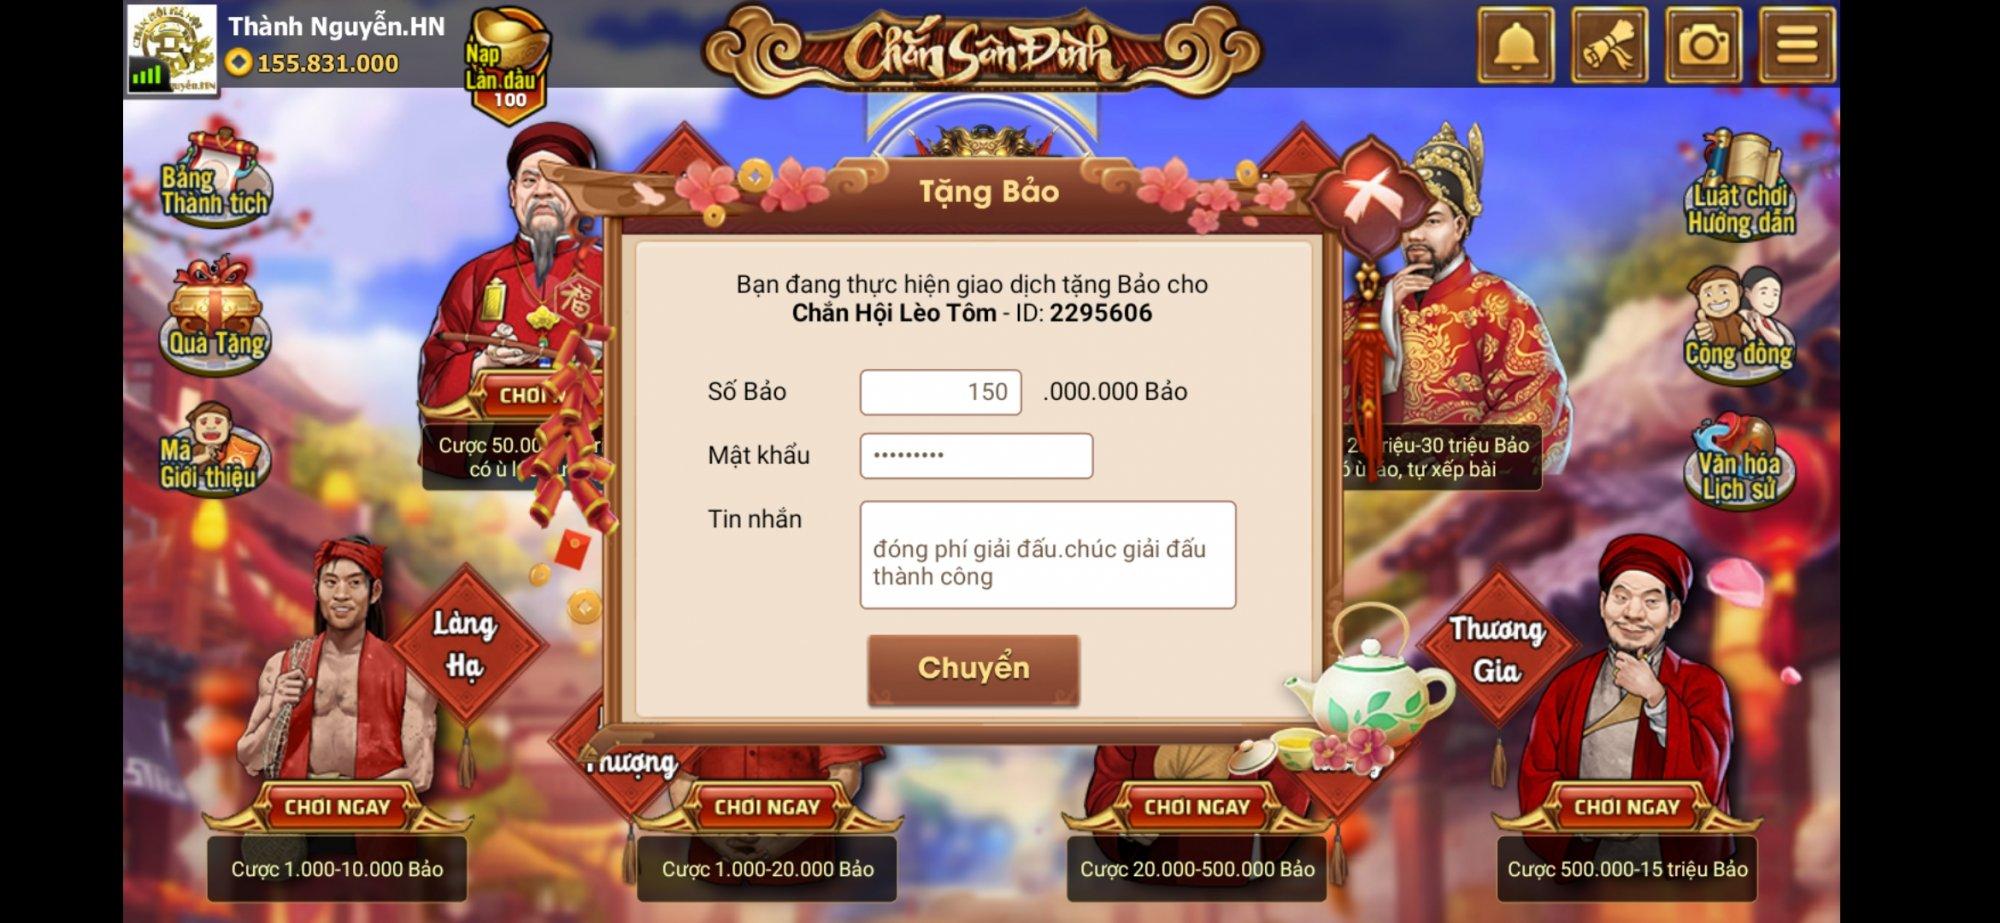 Screenshot_20210329-092749_Chn Sn nh.